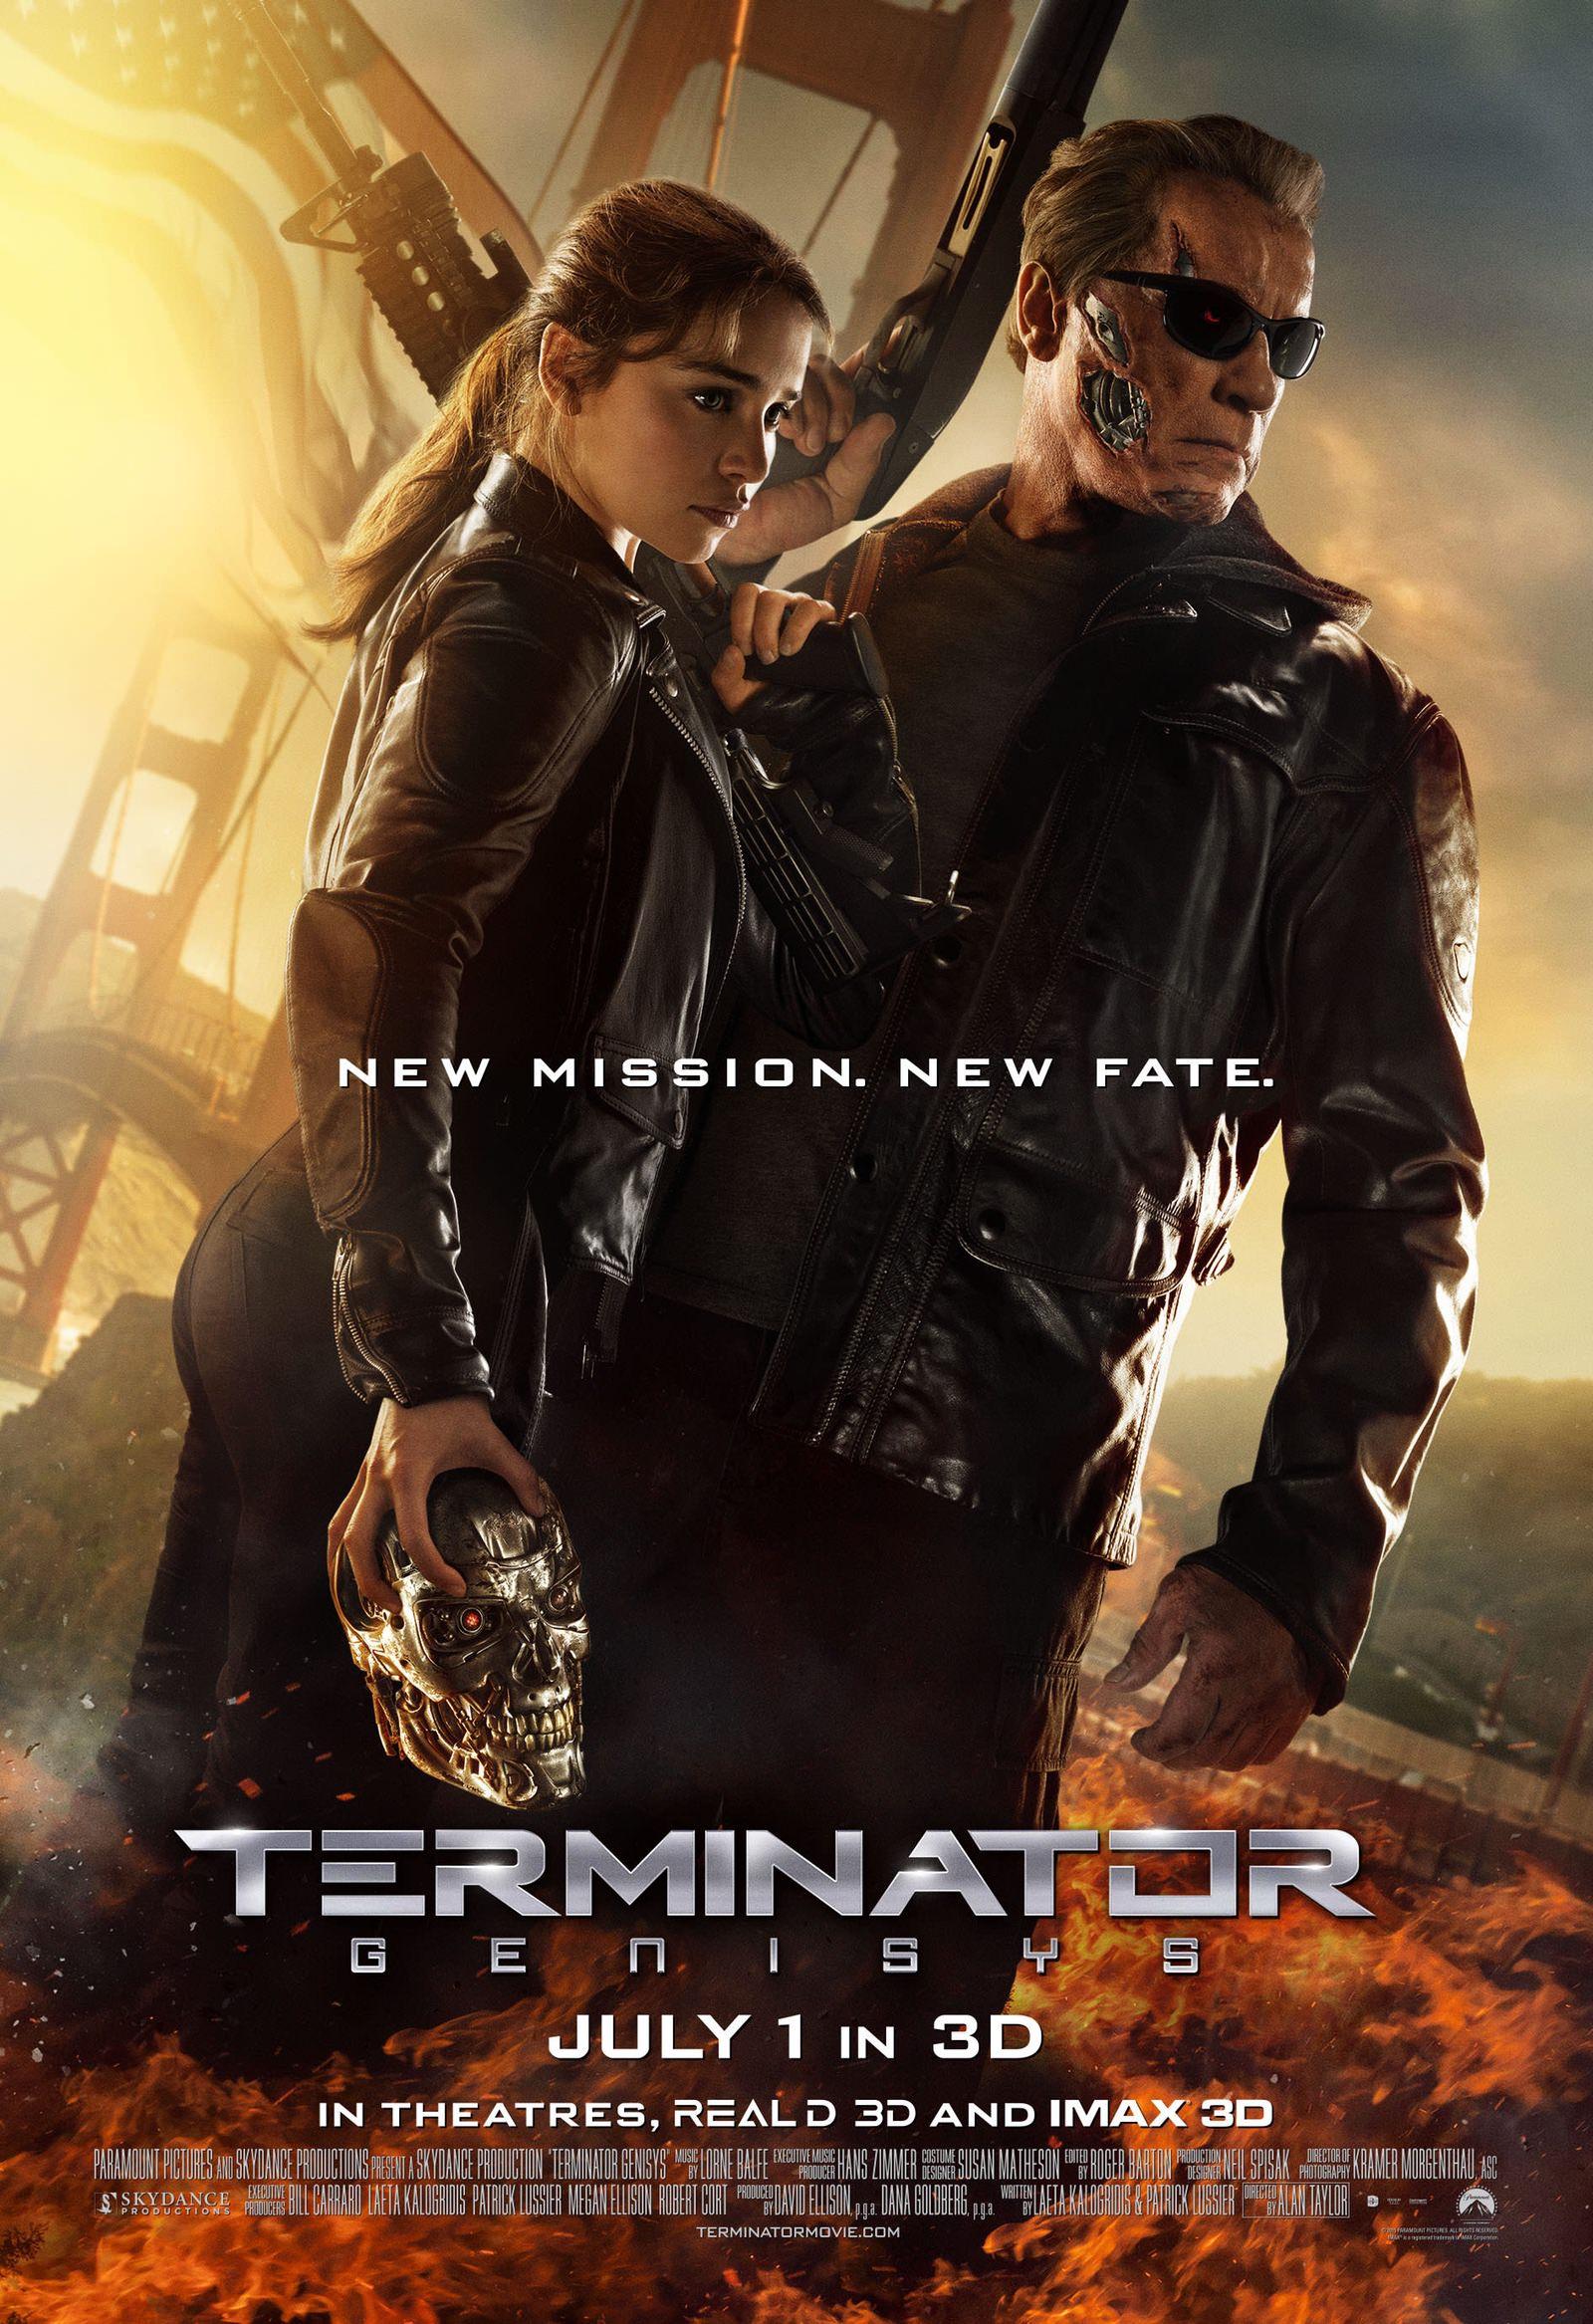 Terminator genisys taylor